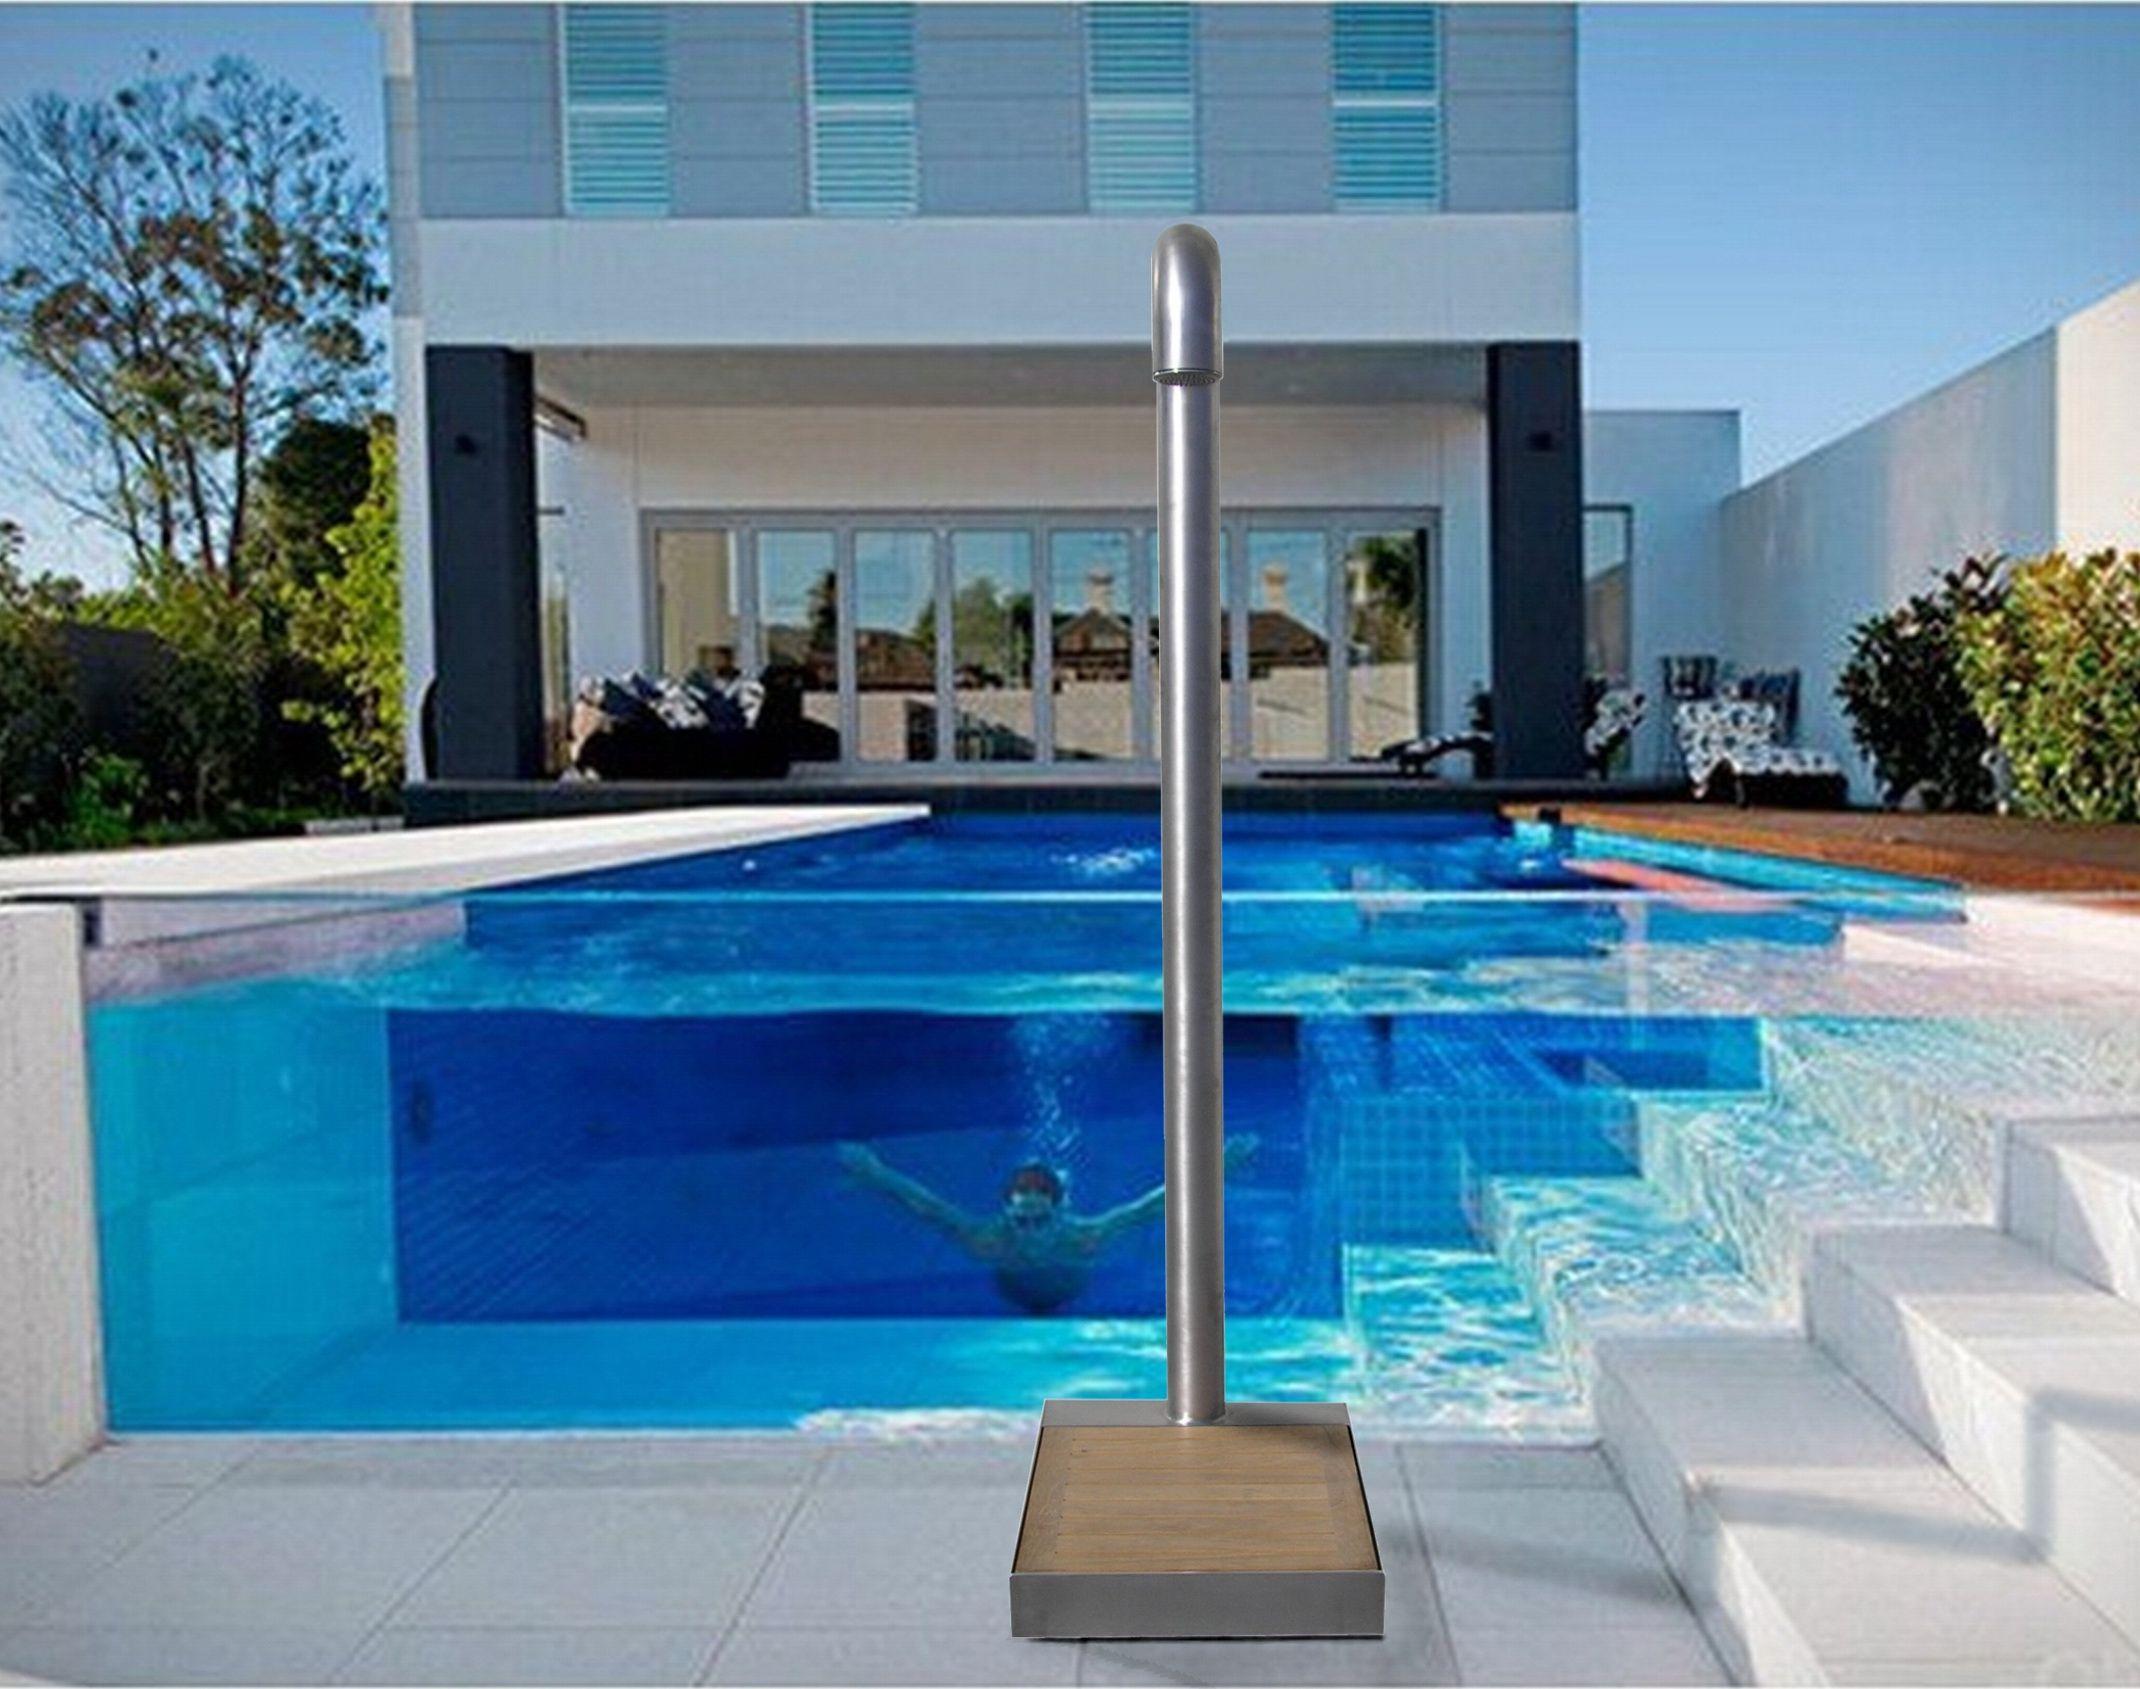 Easy shower a bordo piscina architecture pinterest for Piscinas ramirez